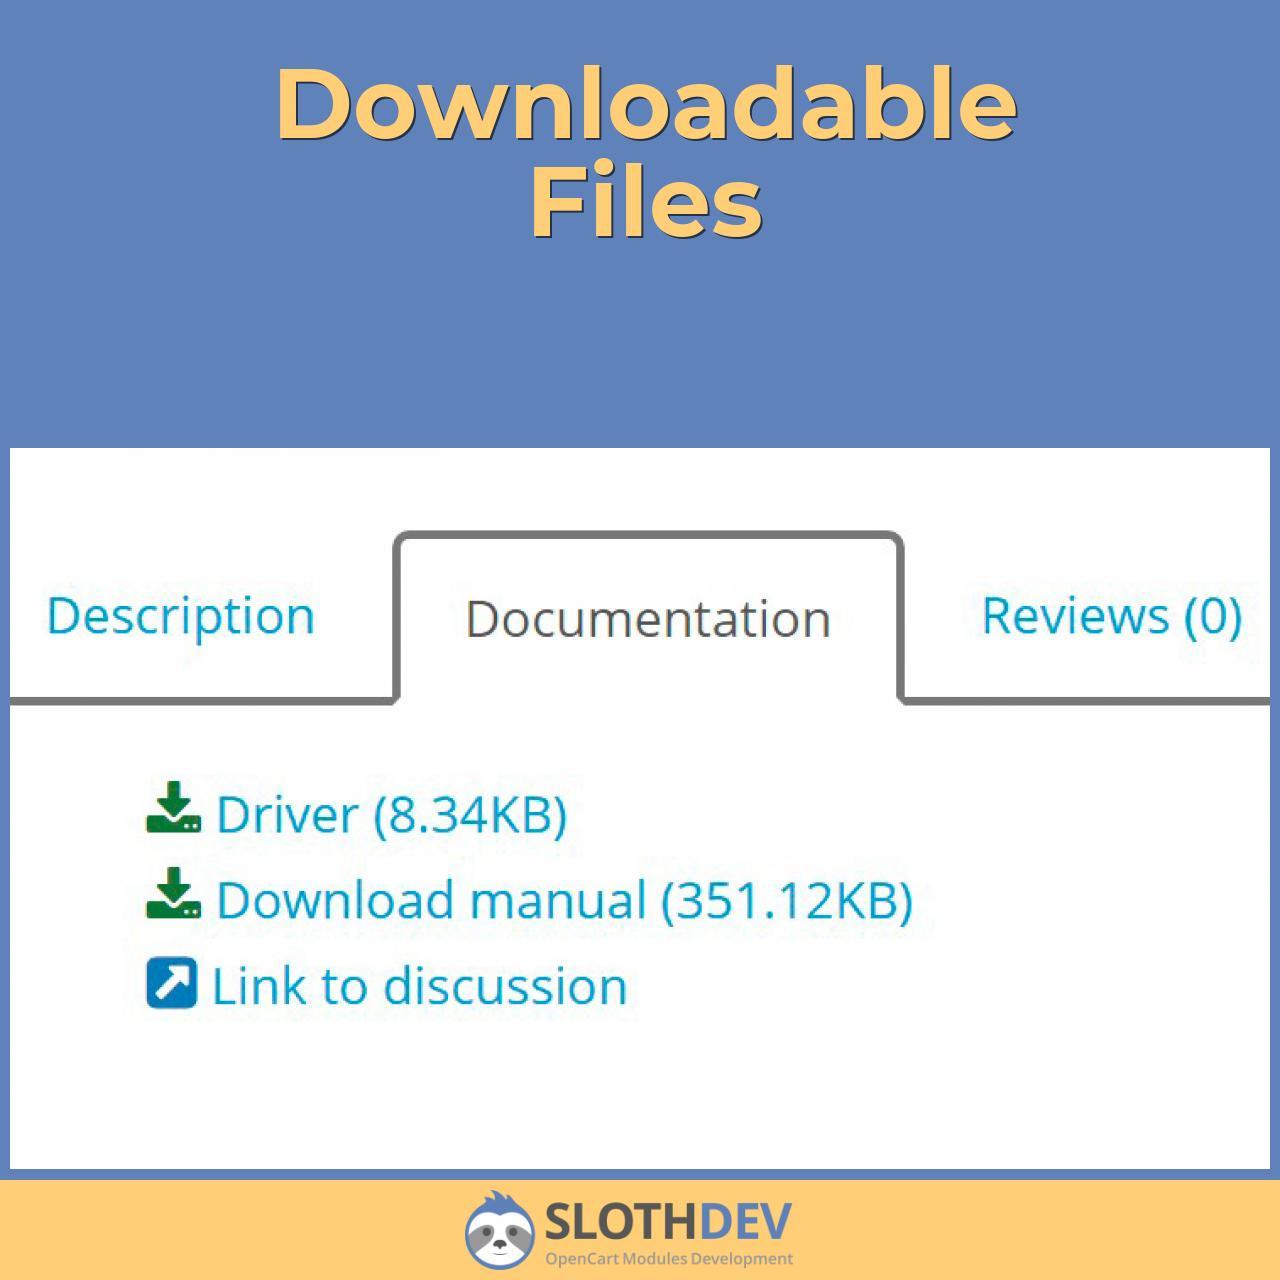 Downloadable Files